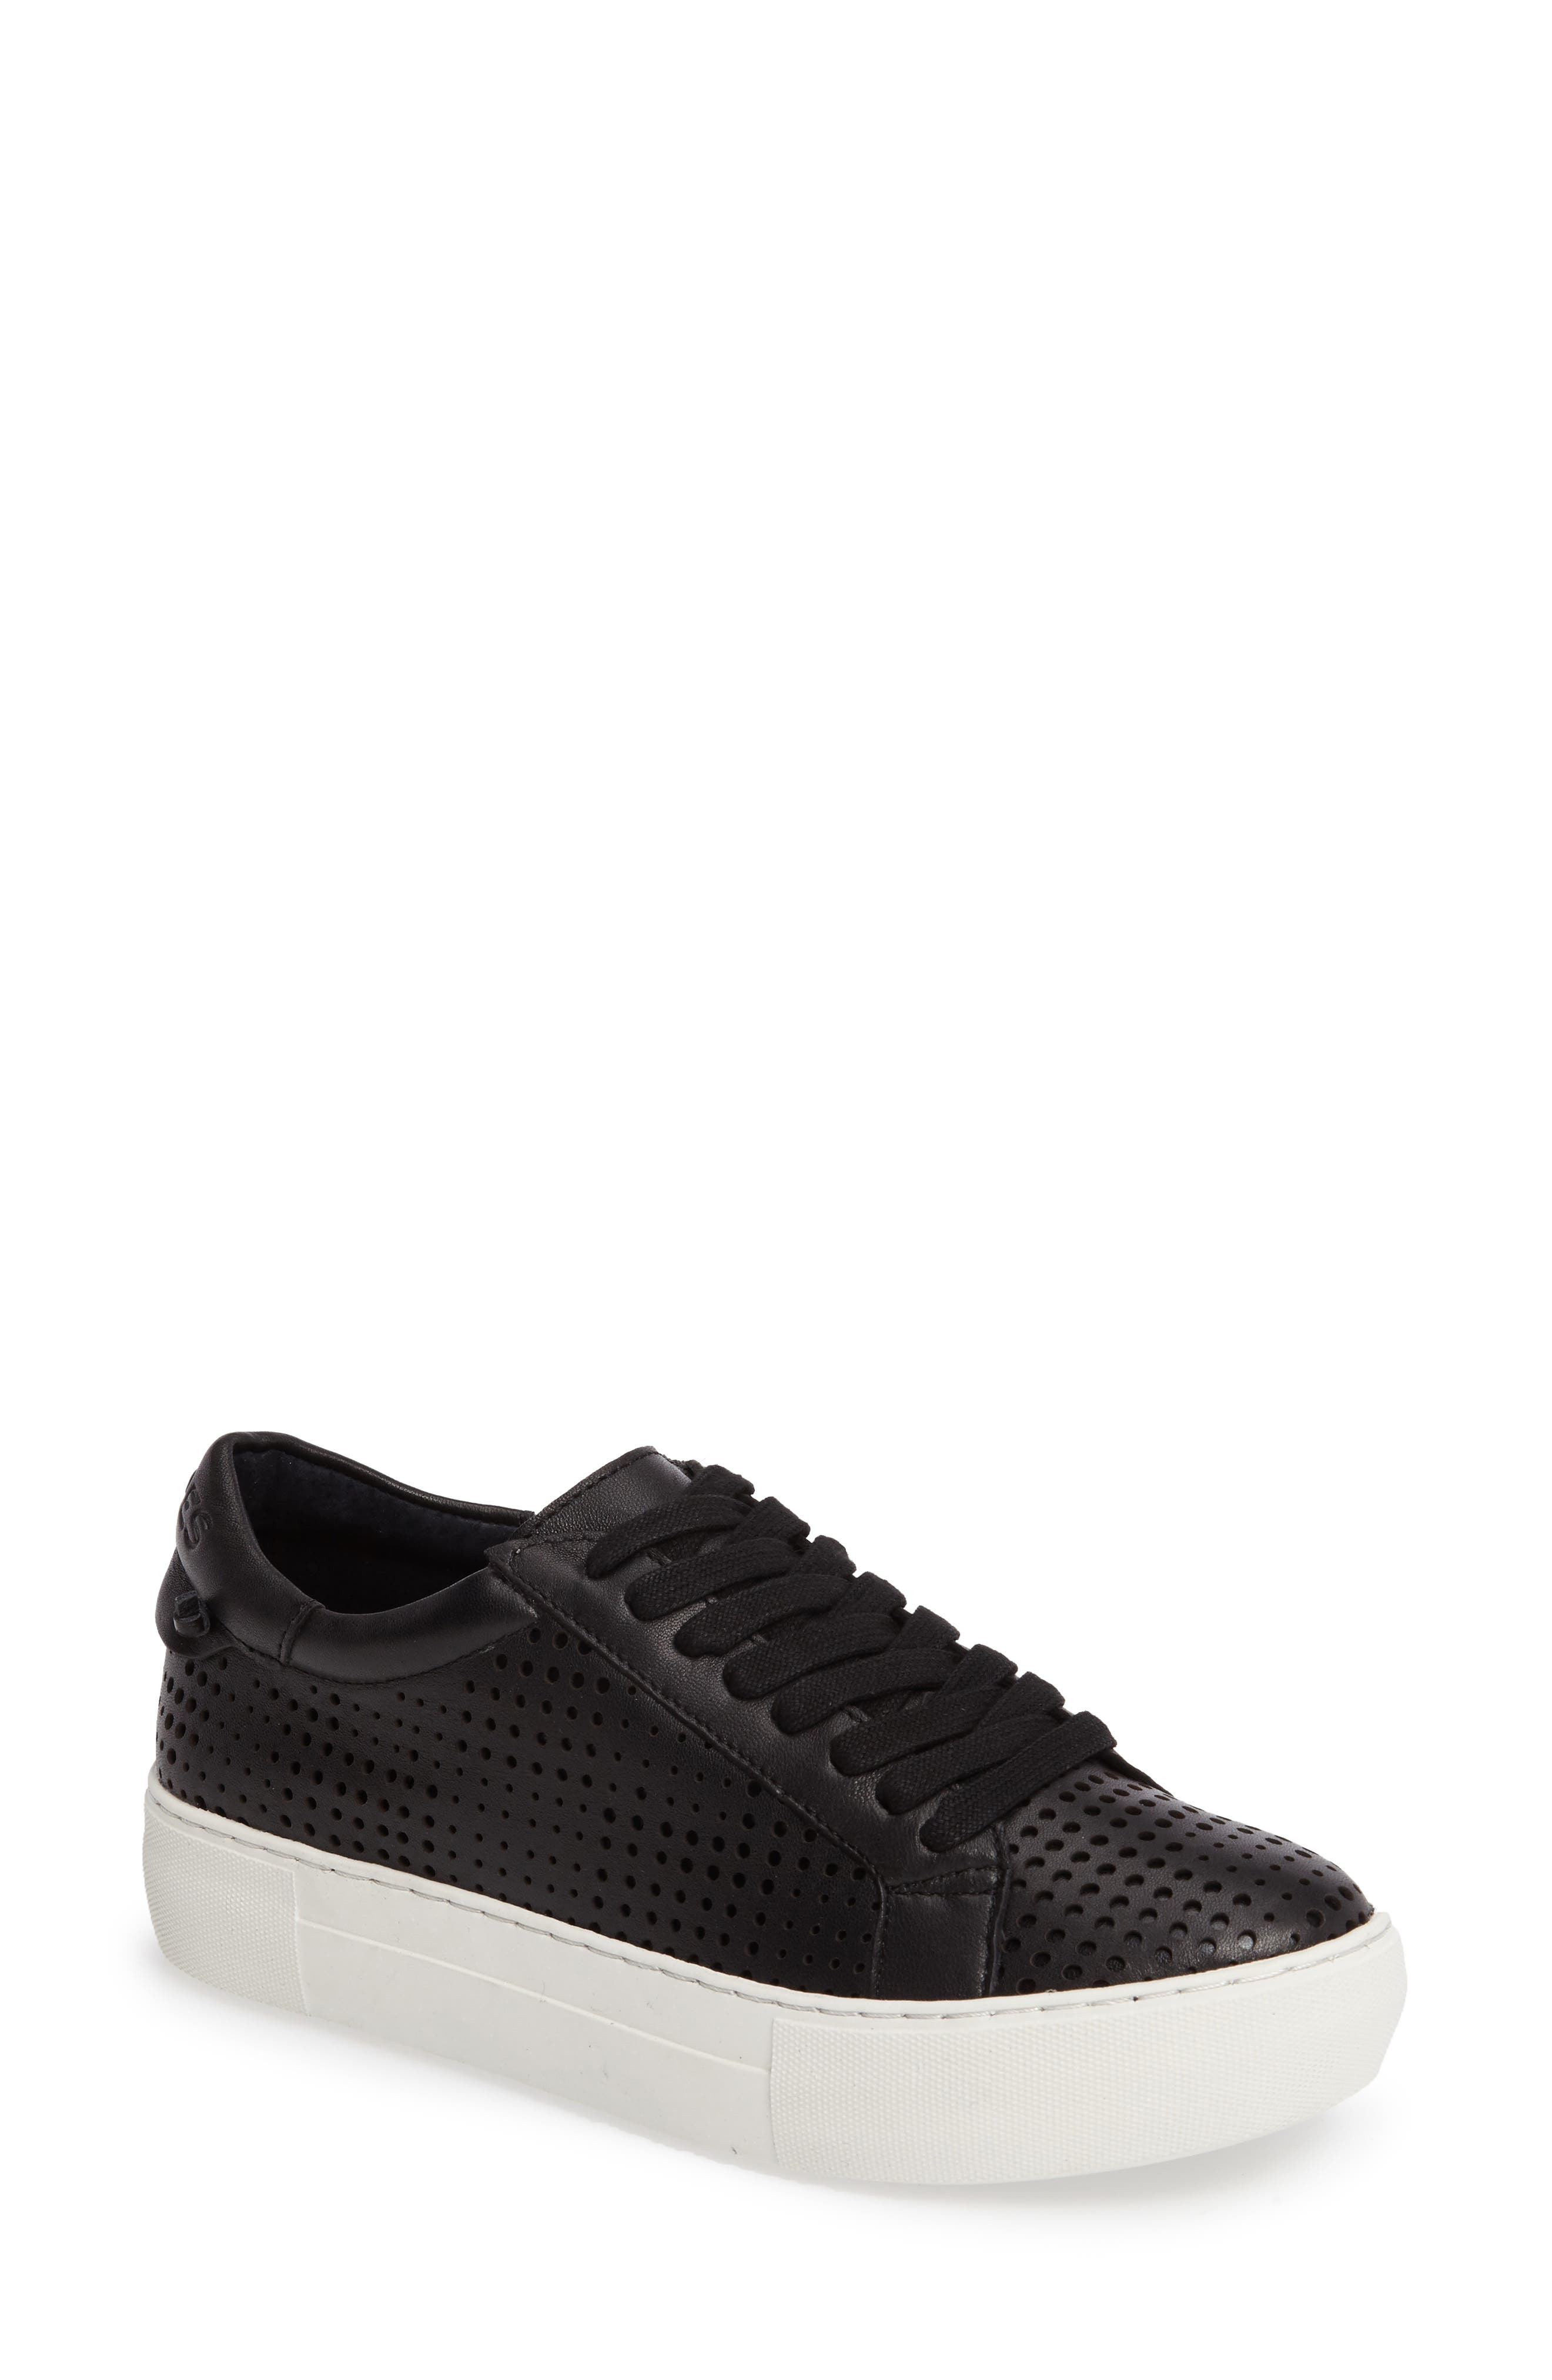 Audrina Platform Sneaker,                             Main thumbnail 1, color,                             Black Leather